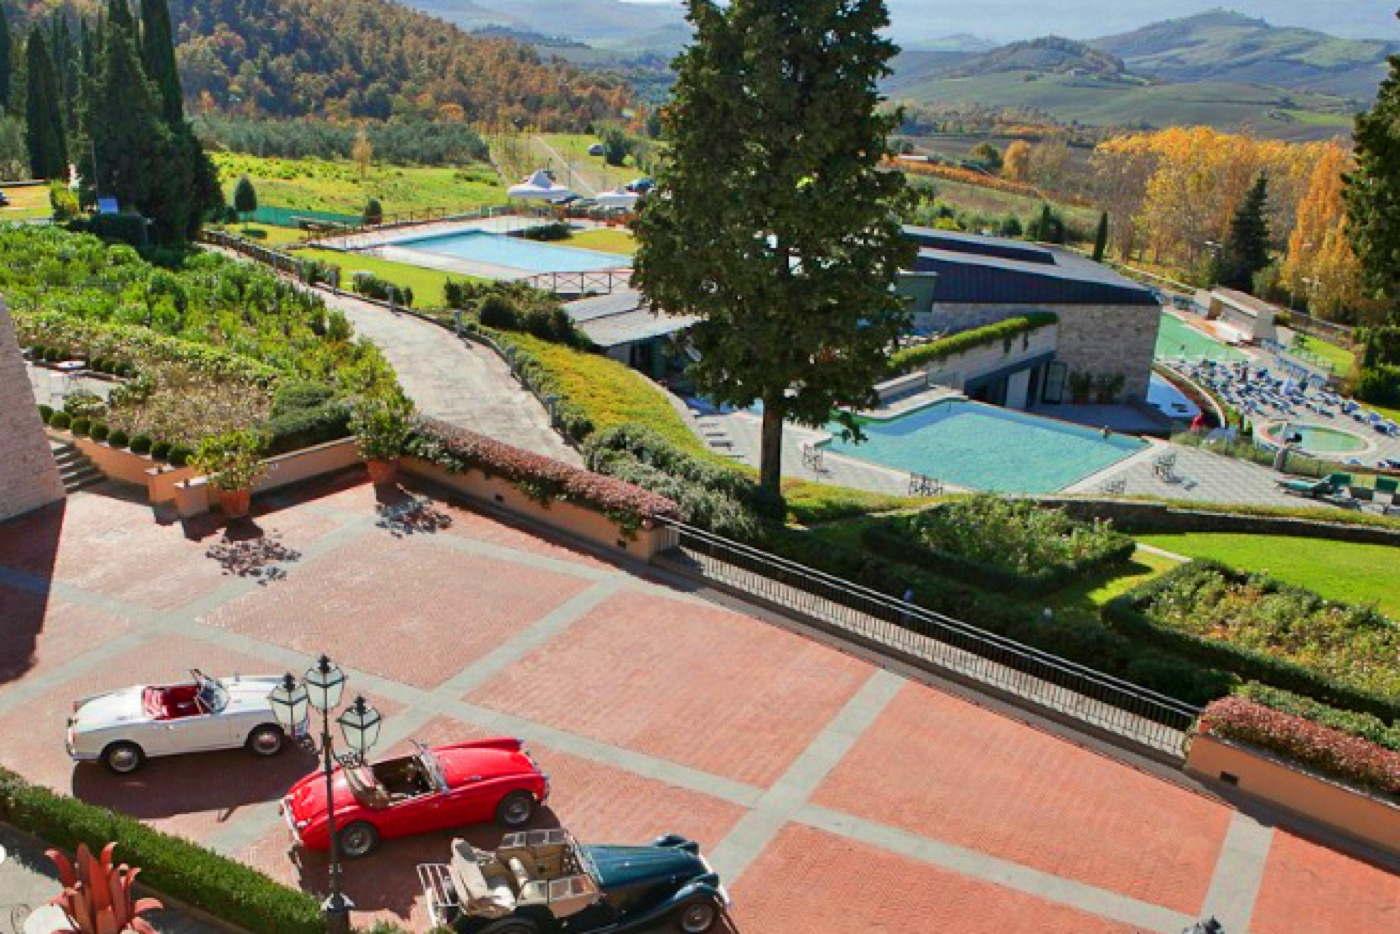 Italien toskana siena luxushotel designhotel spa hotel mit for Designhotel toskana